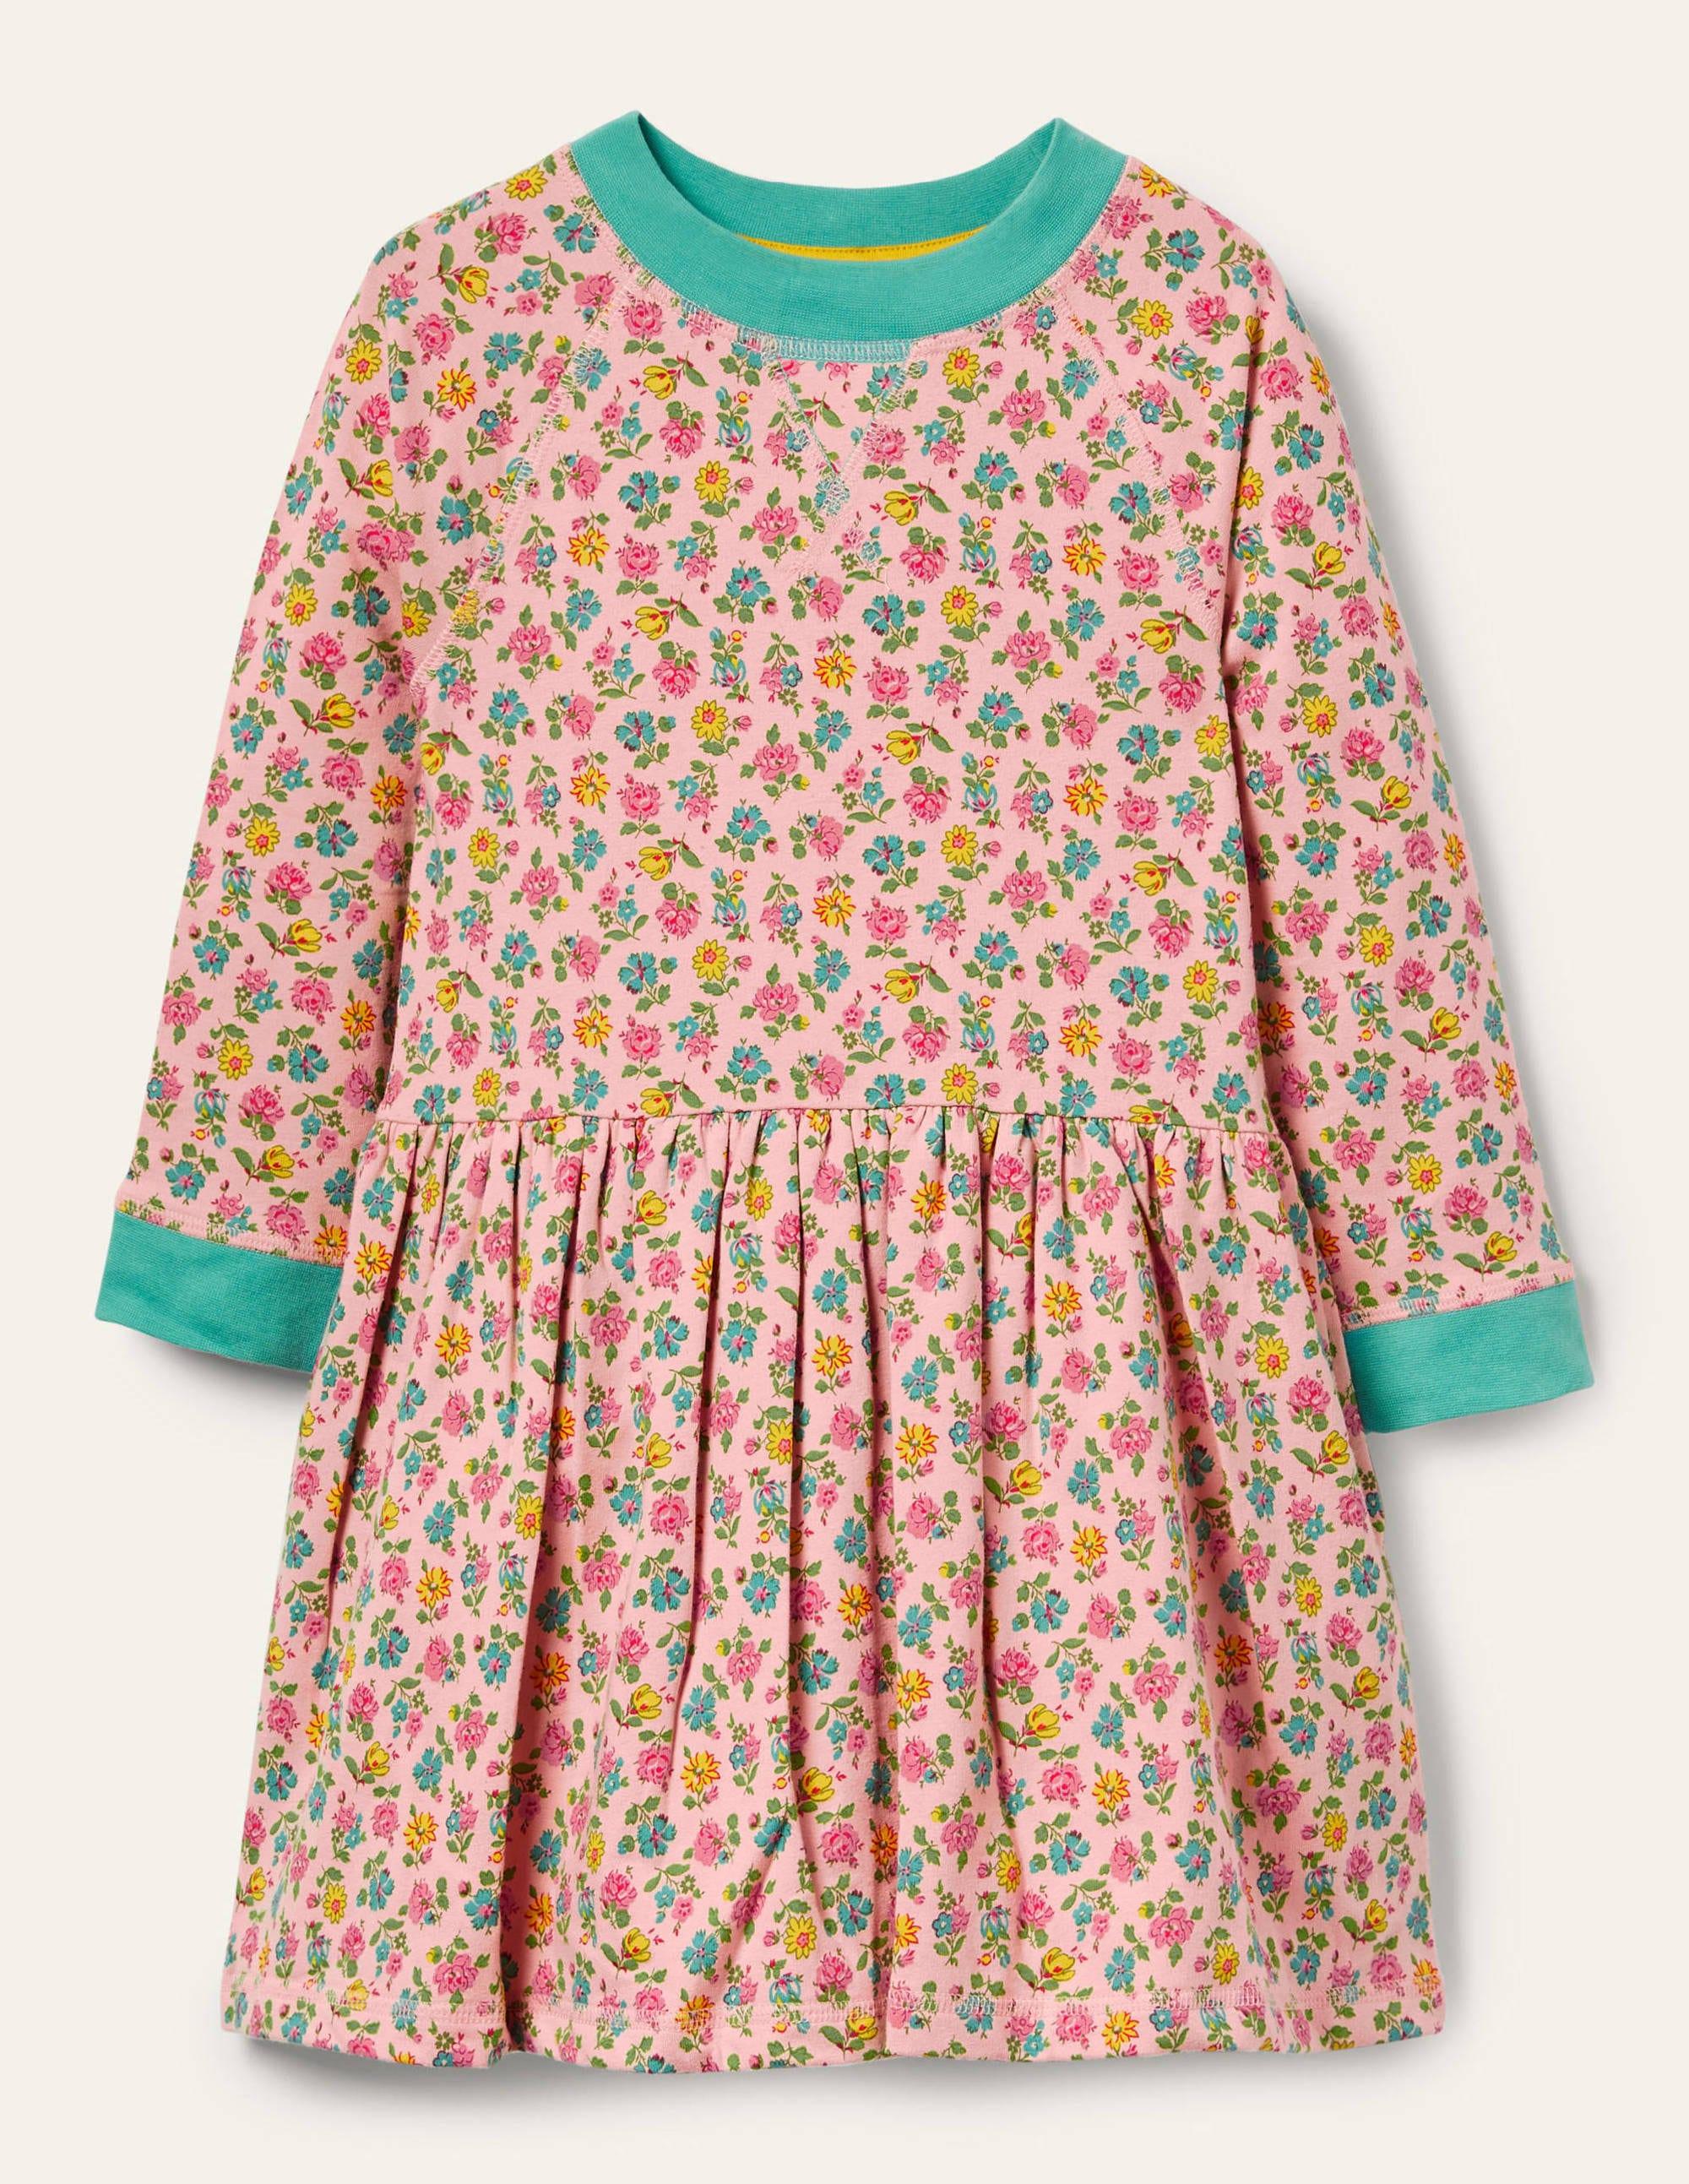 Boden Jersey Sweatshirt Dress - Provence Pink Patchwork Floral